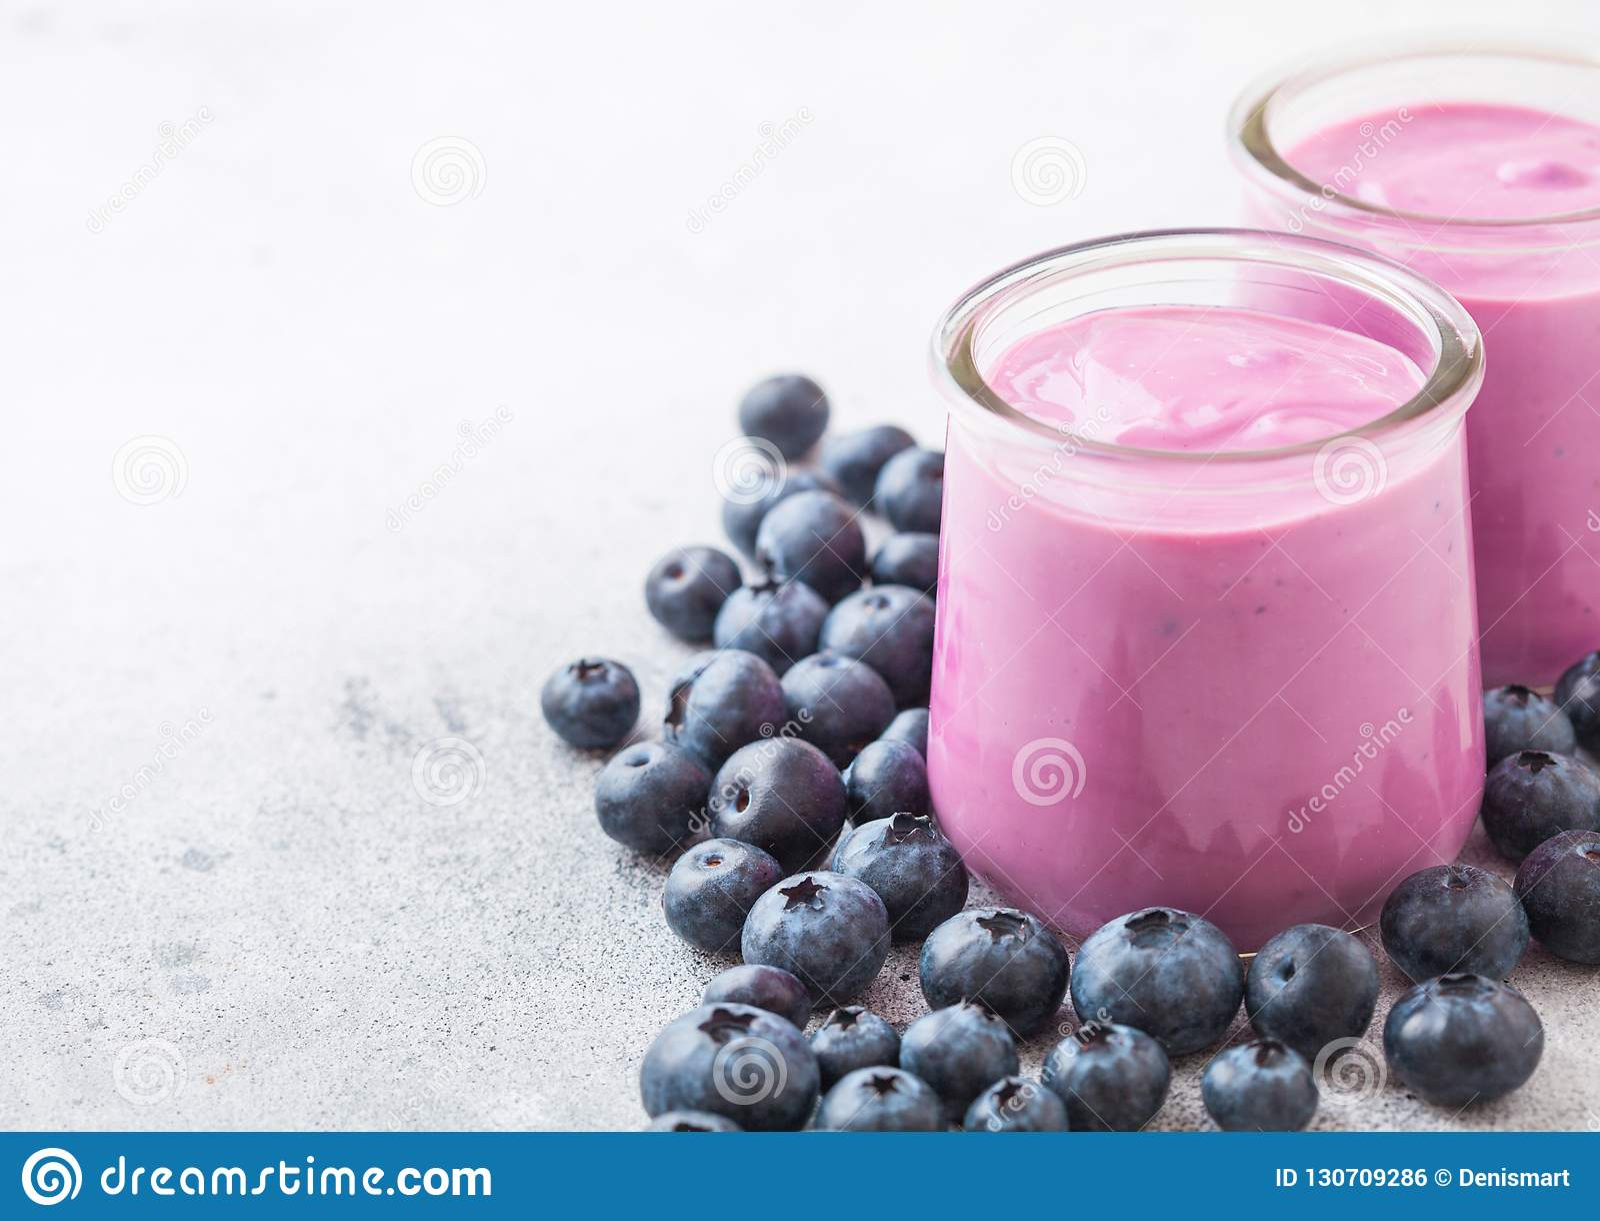 Fresh hommemade creamy blueberry yoghurt with fresh blueberries on stone kitchen table background